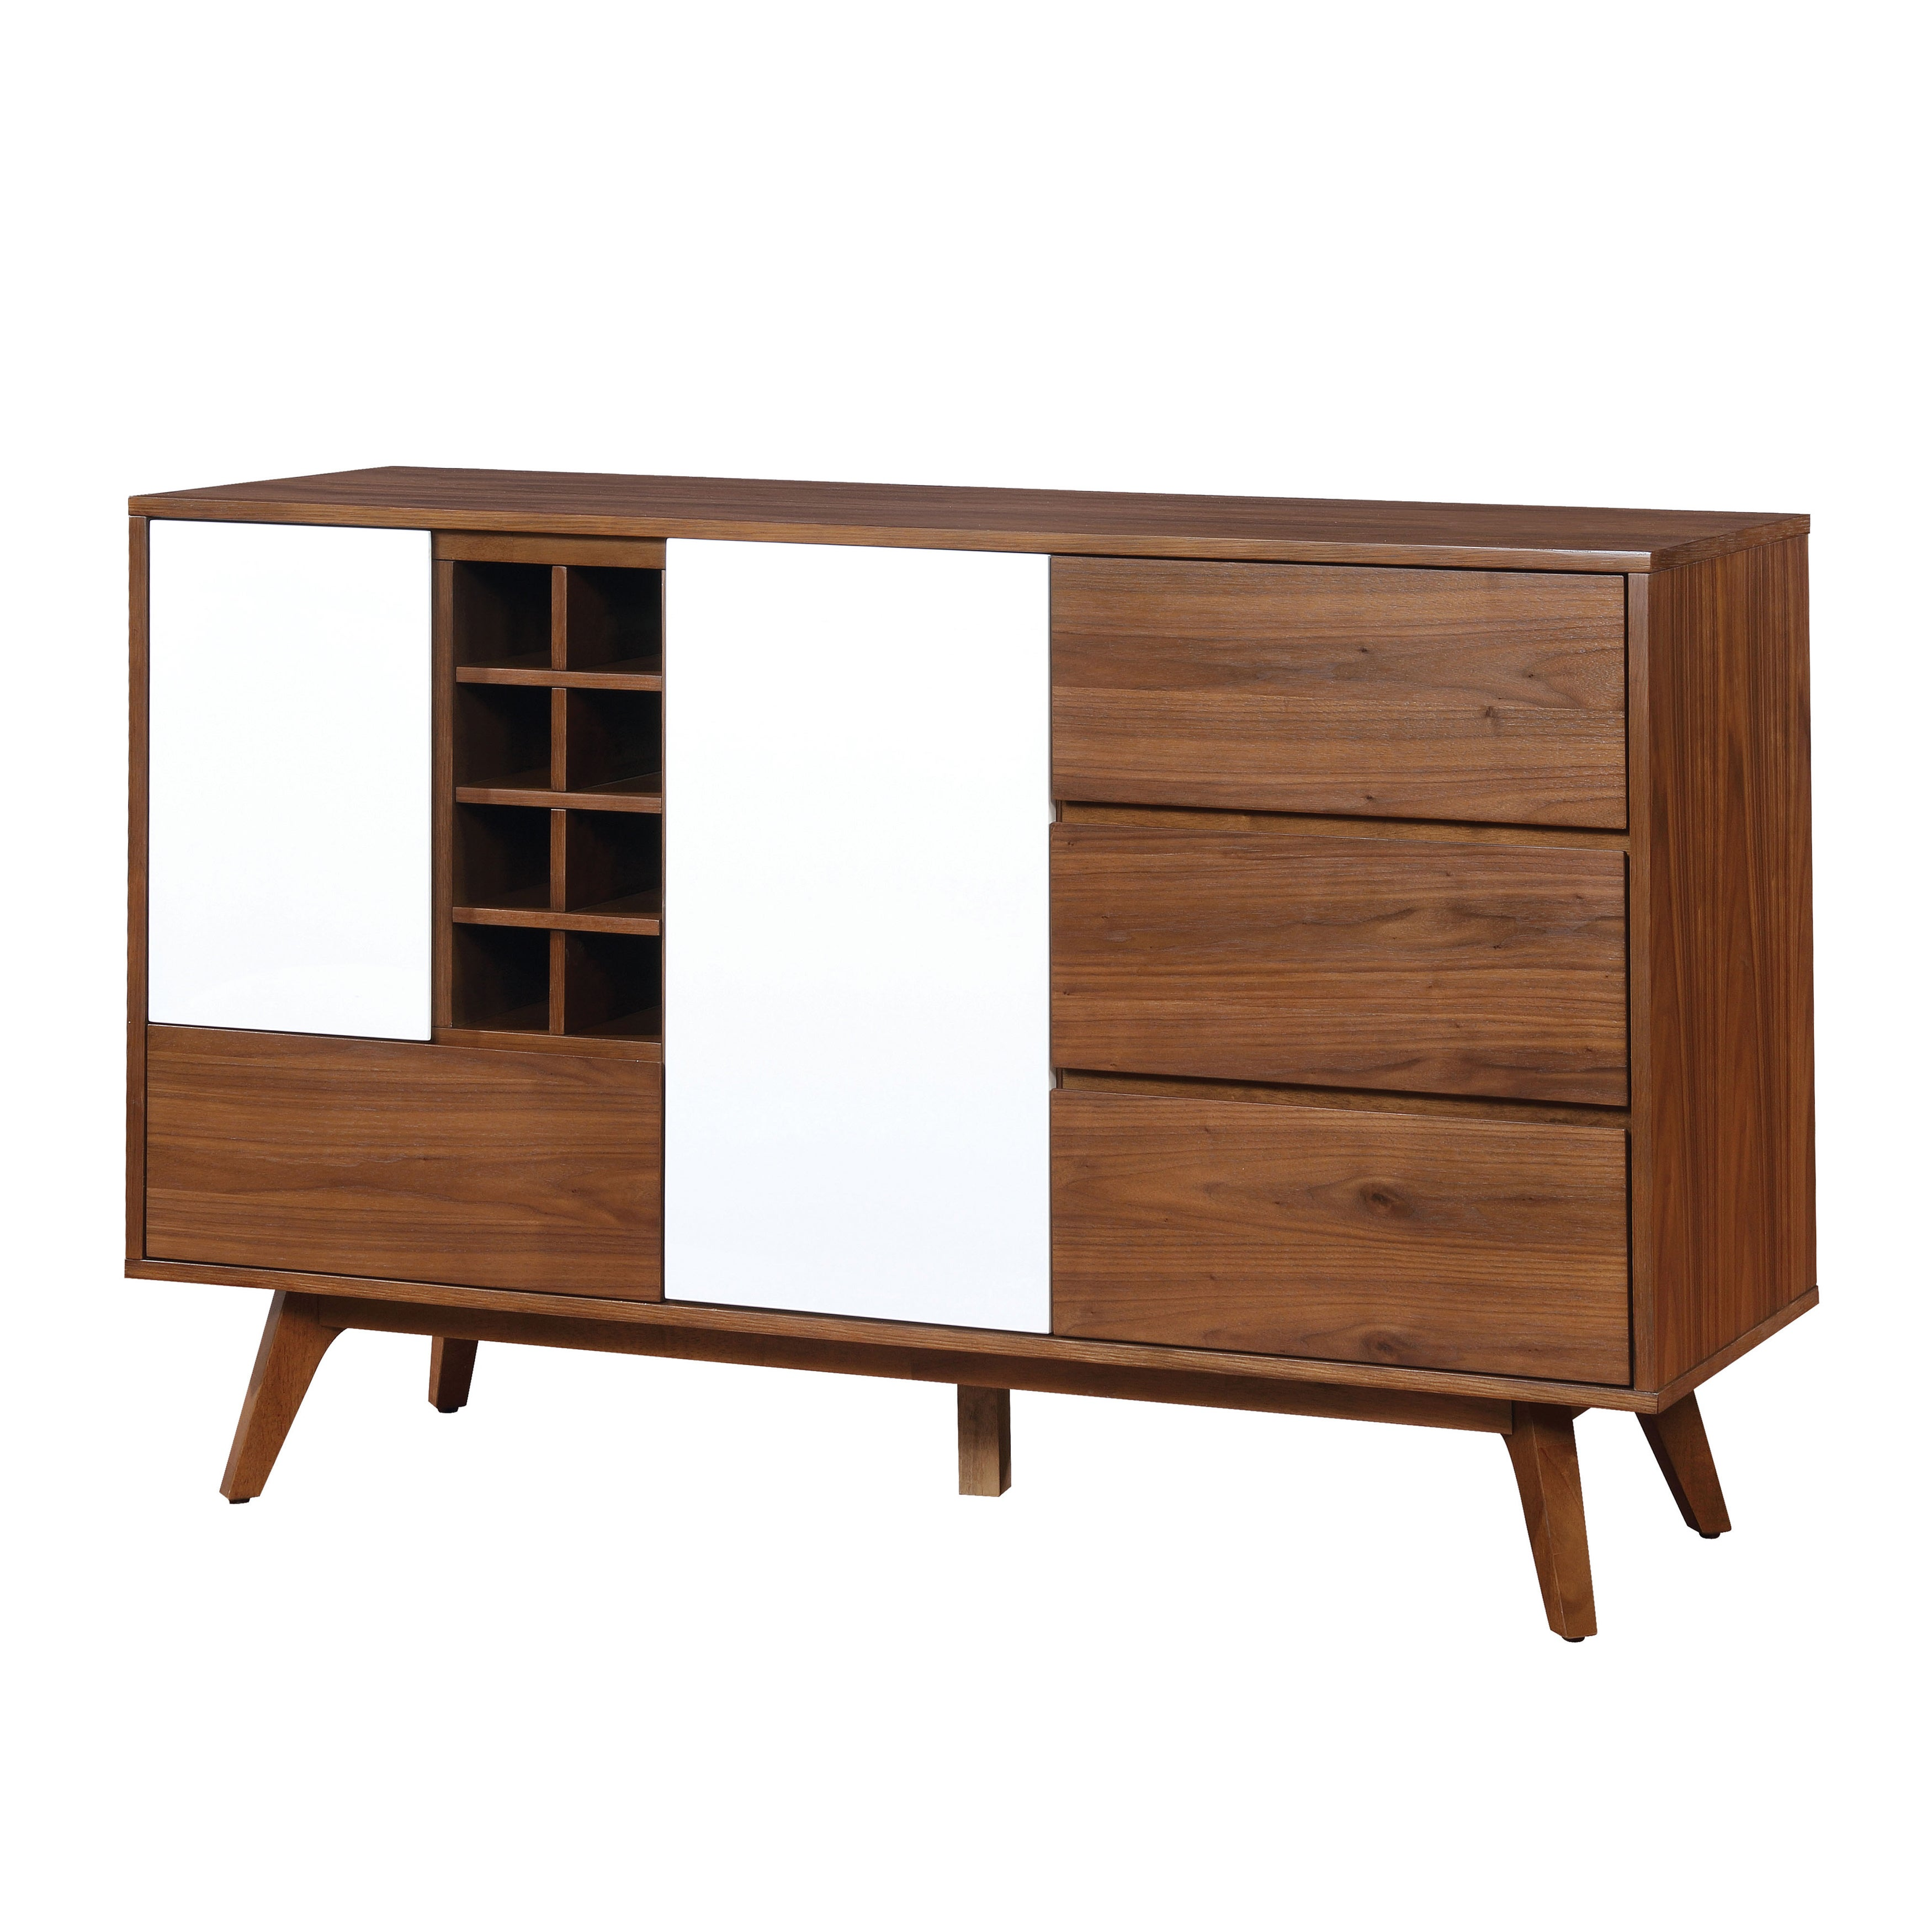 Shop Furniture Of America Liman Mid Century Modern 2 Tone Oak White